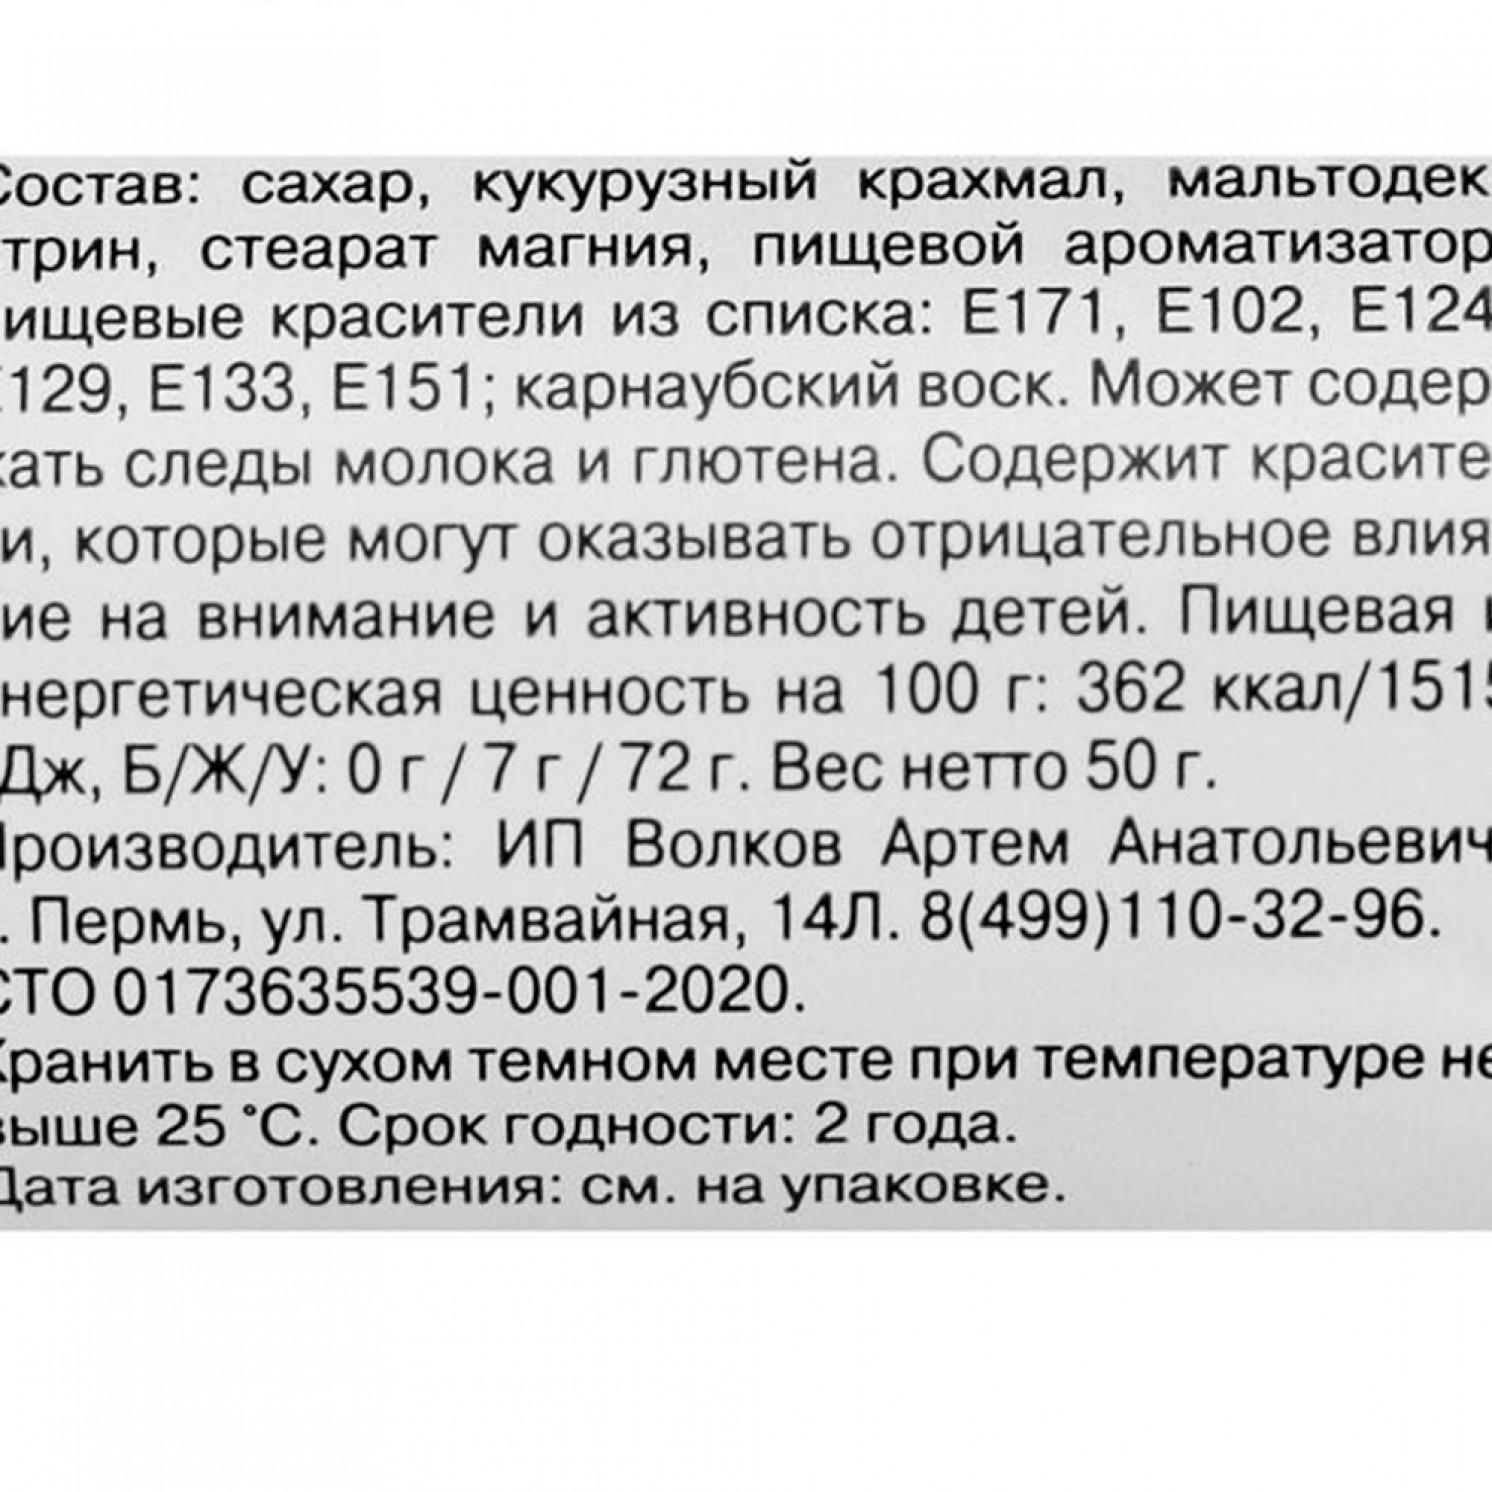 Посыпка микс «Нежные чувства», 50 г